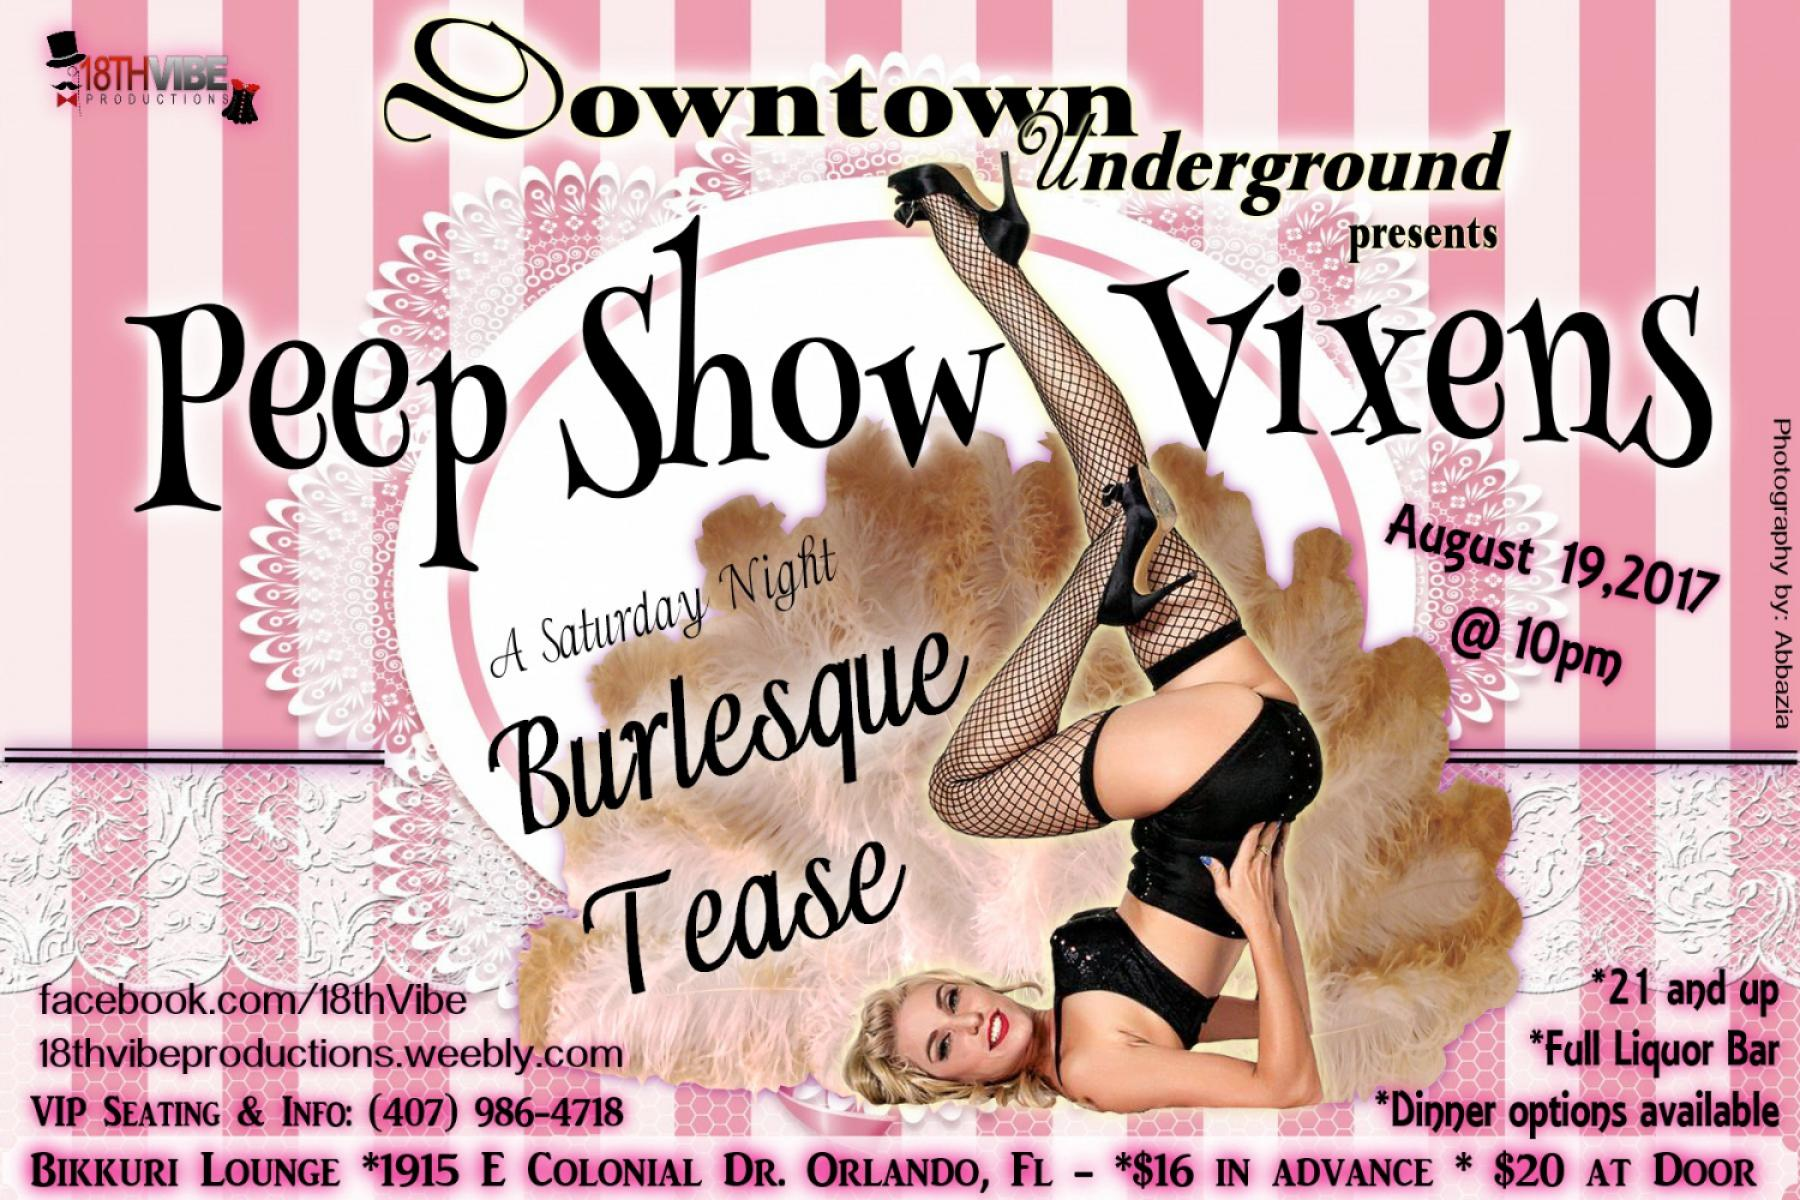 Peep Show Vixens Burlesque & Cabaret